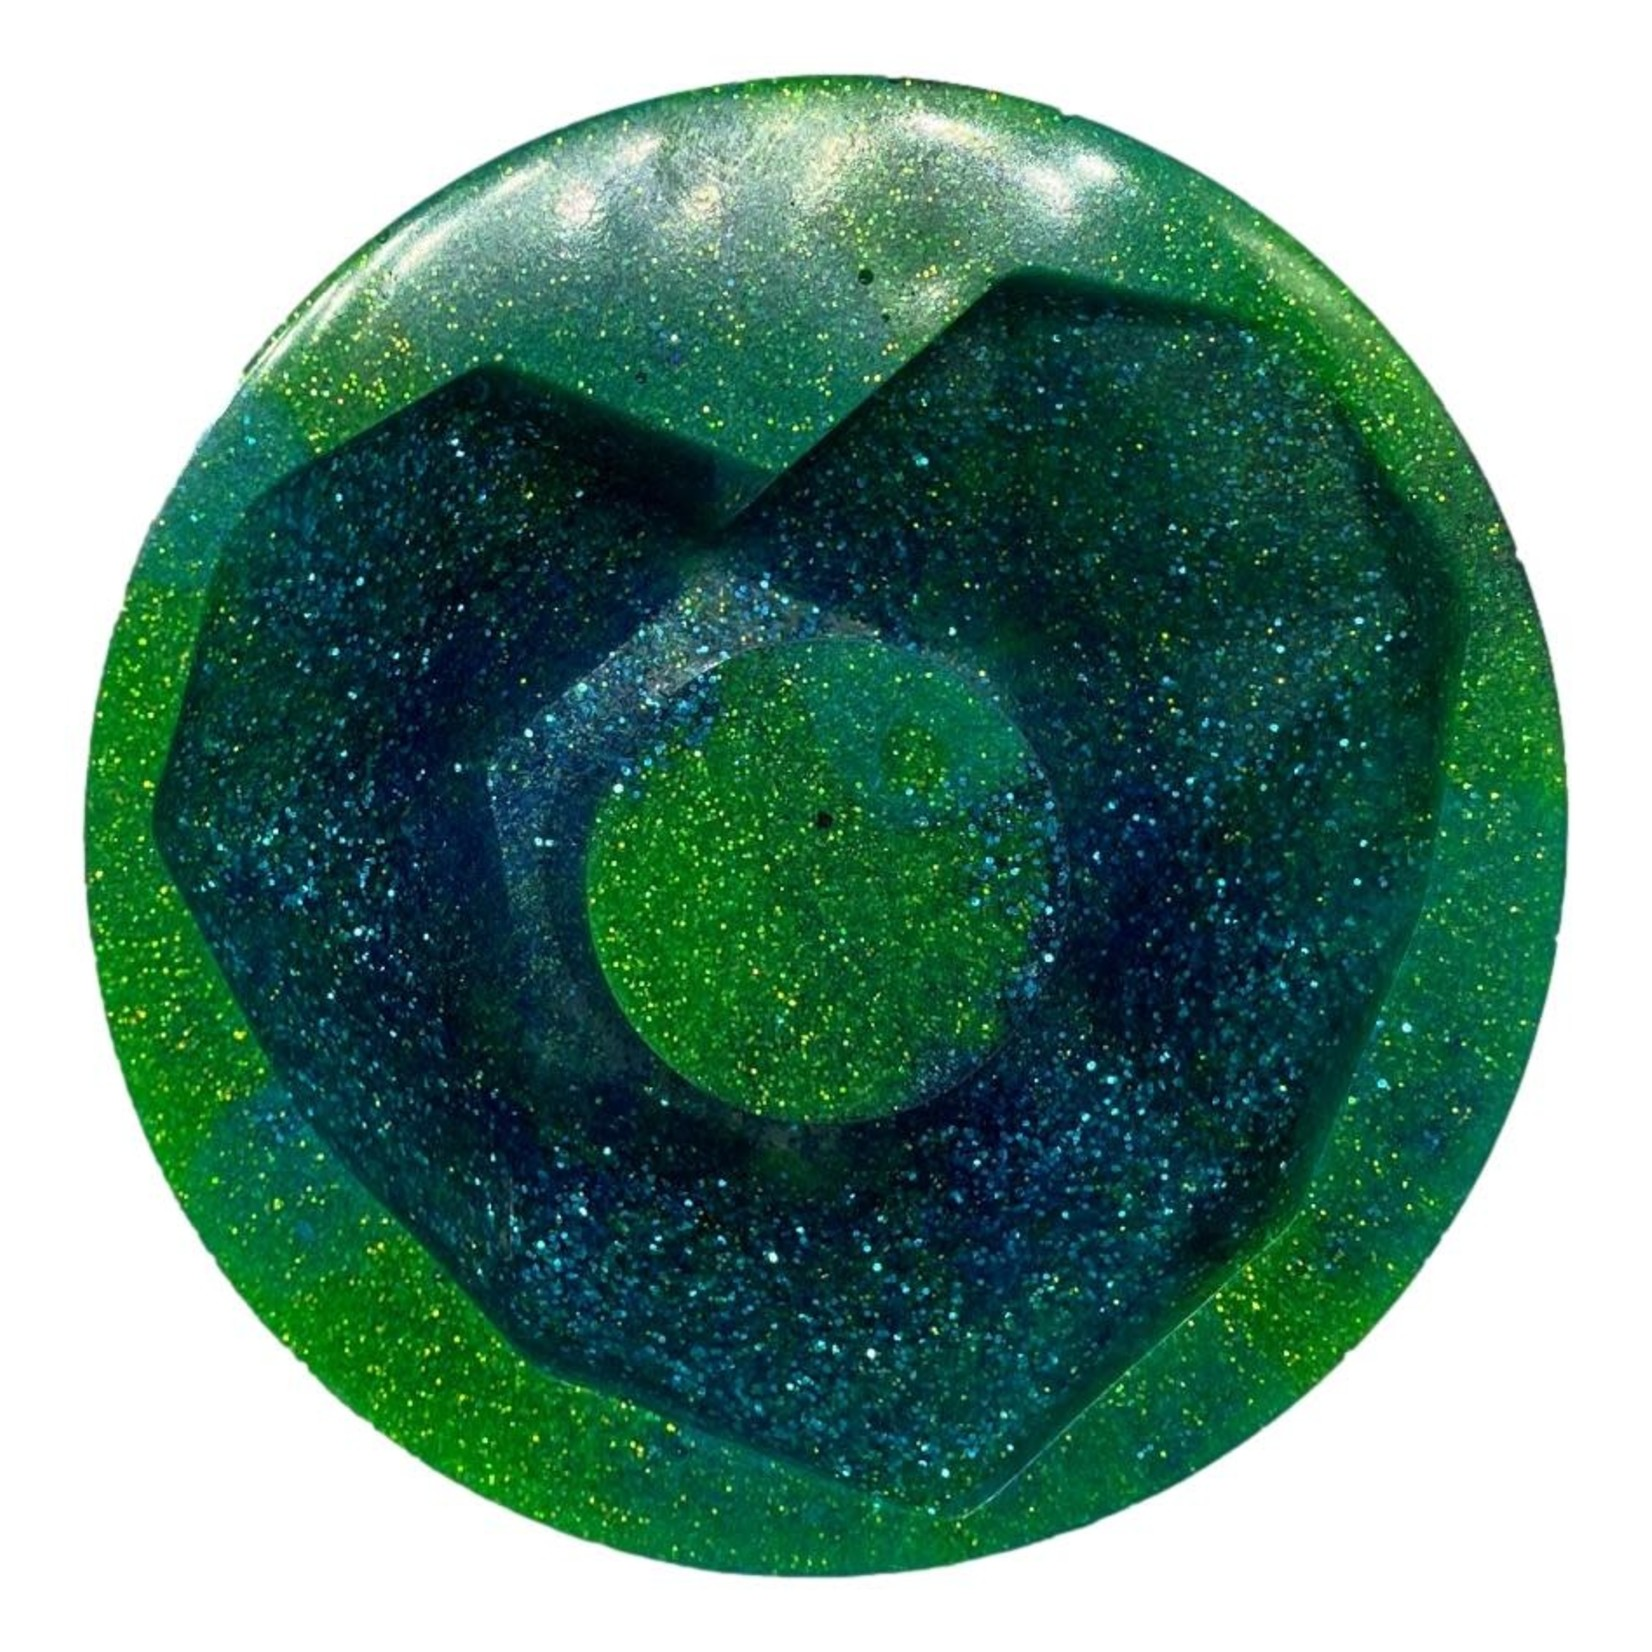 East Coast Sirens Blue & Green Geometric Heart Planter